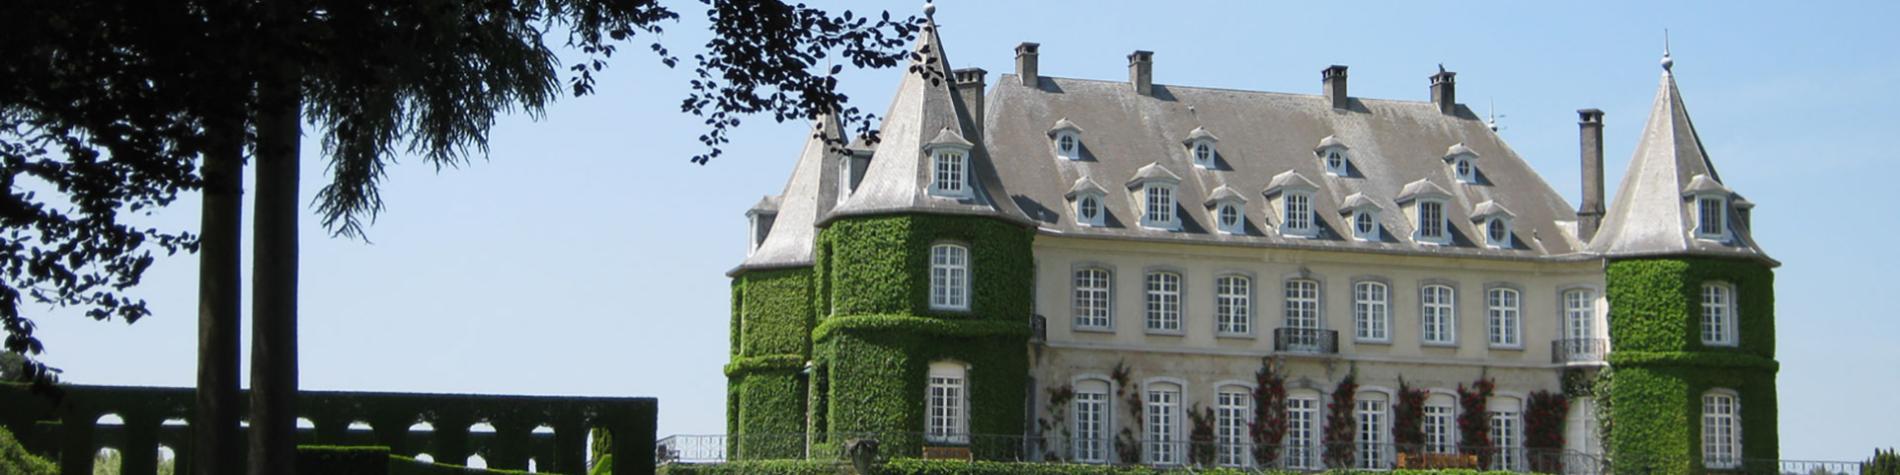 Domaine Régional Solvay - Château - la Hulpe - MICE